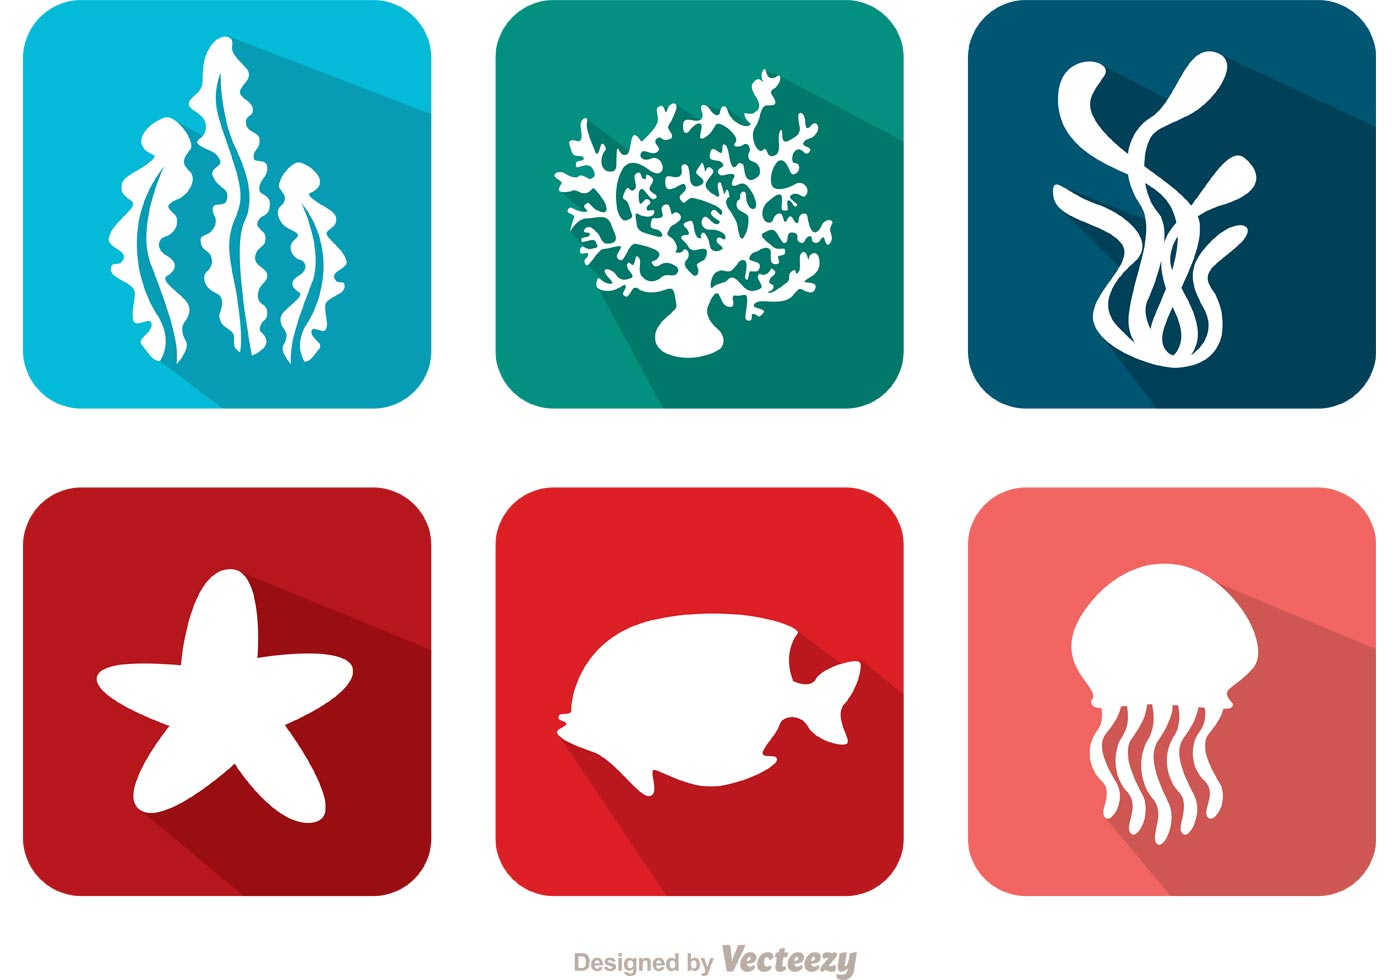 Flat Coral Reef And Fish Vectors - Download Free Vector Art, Stock ...